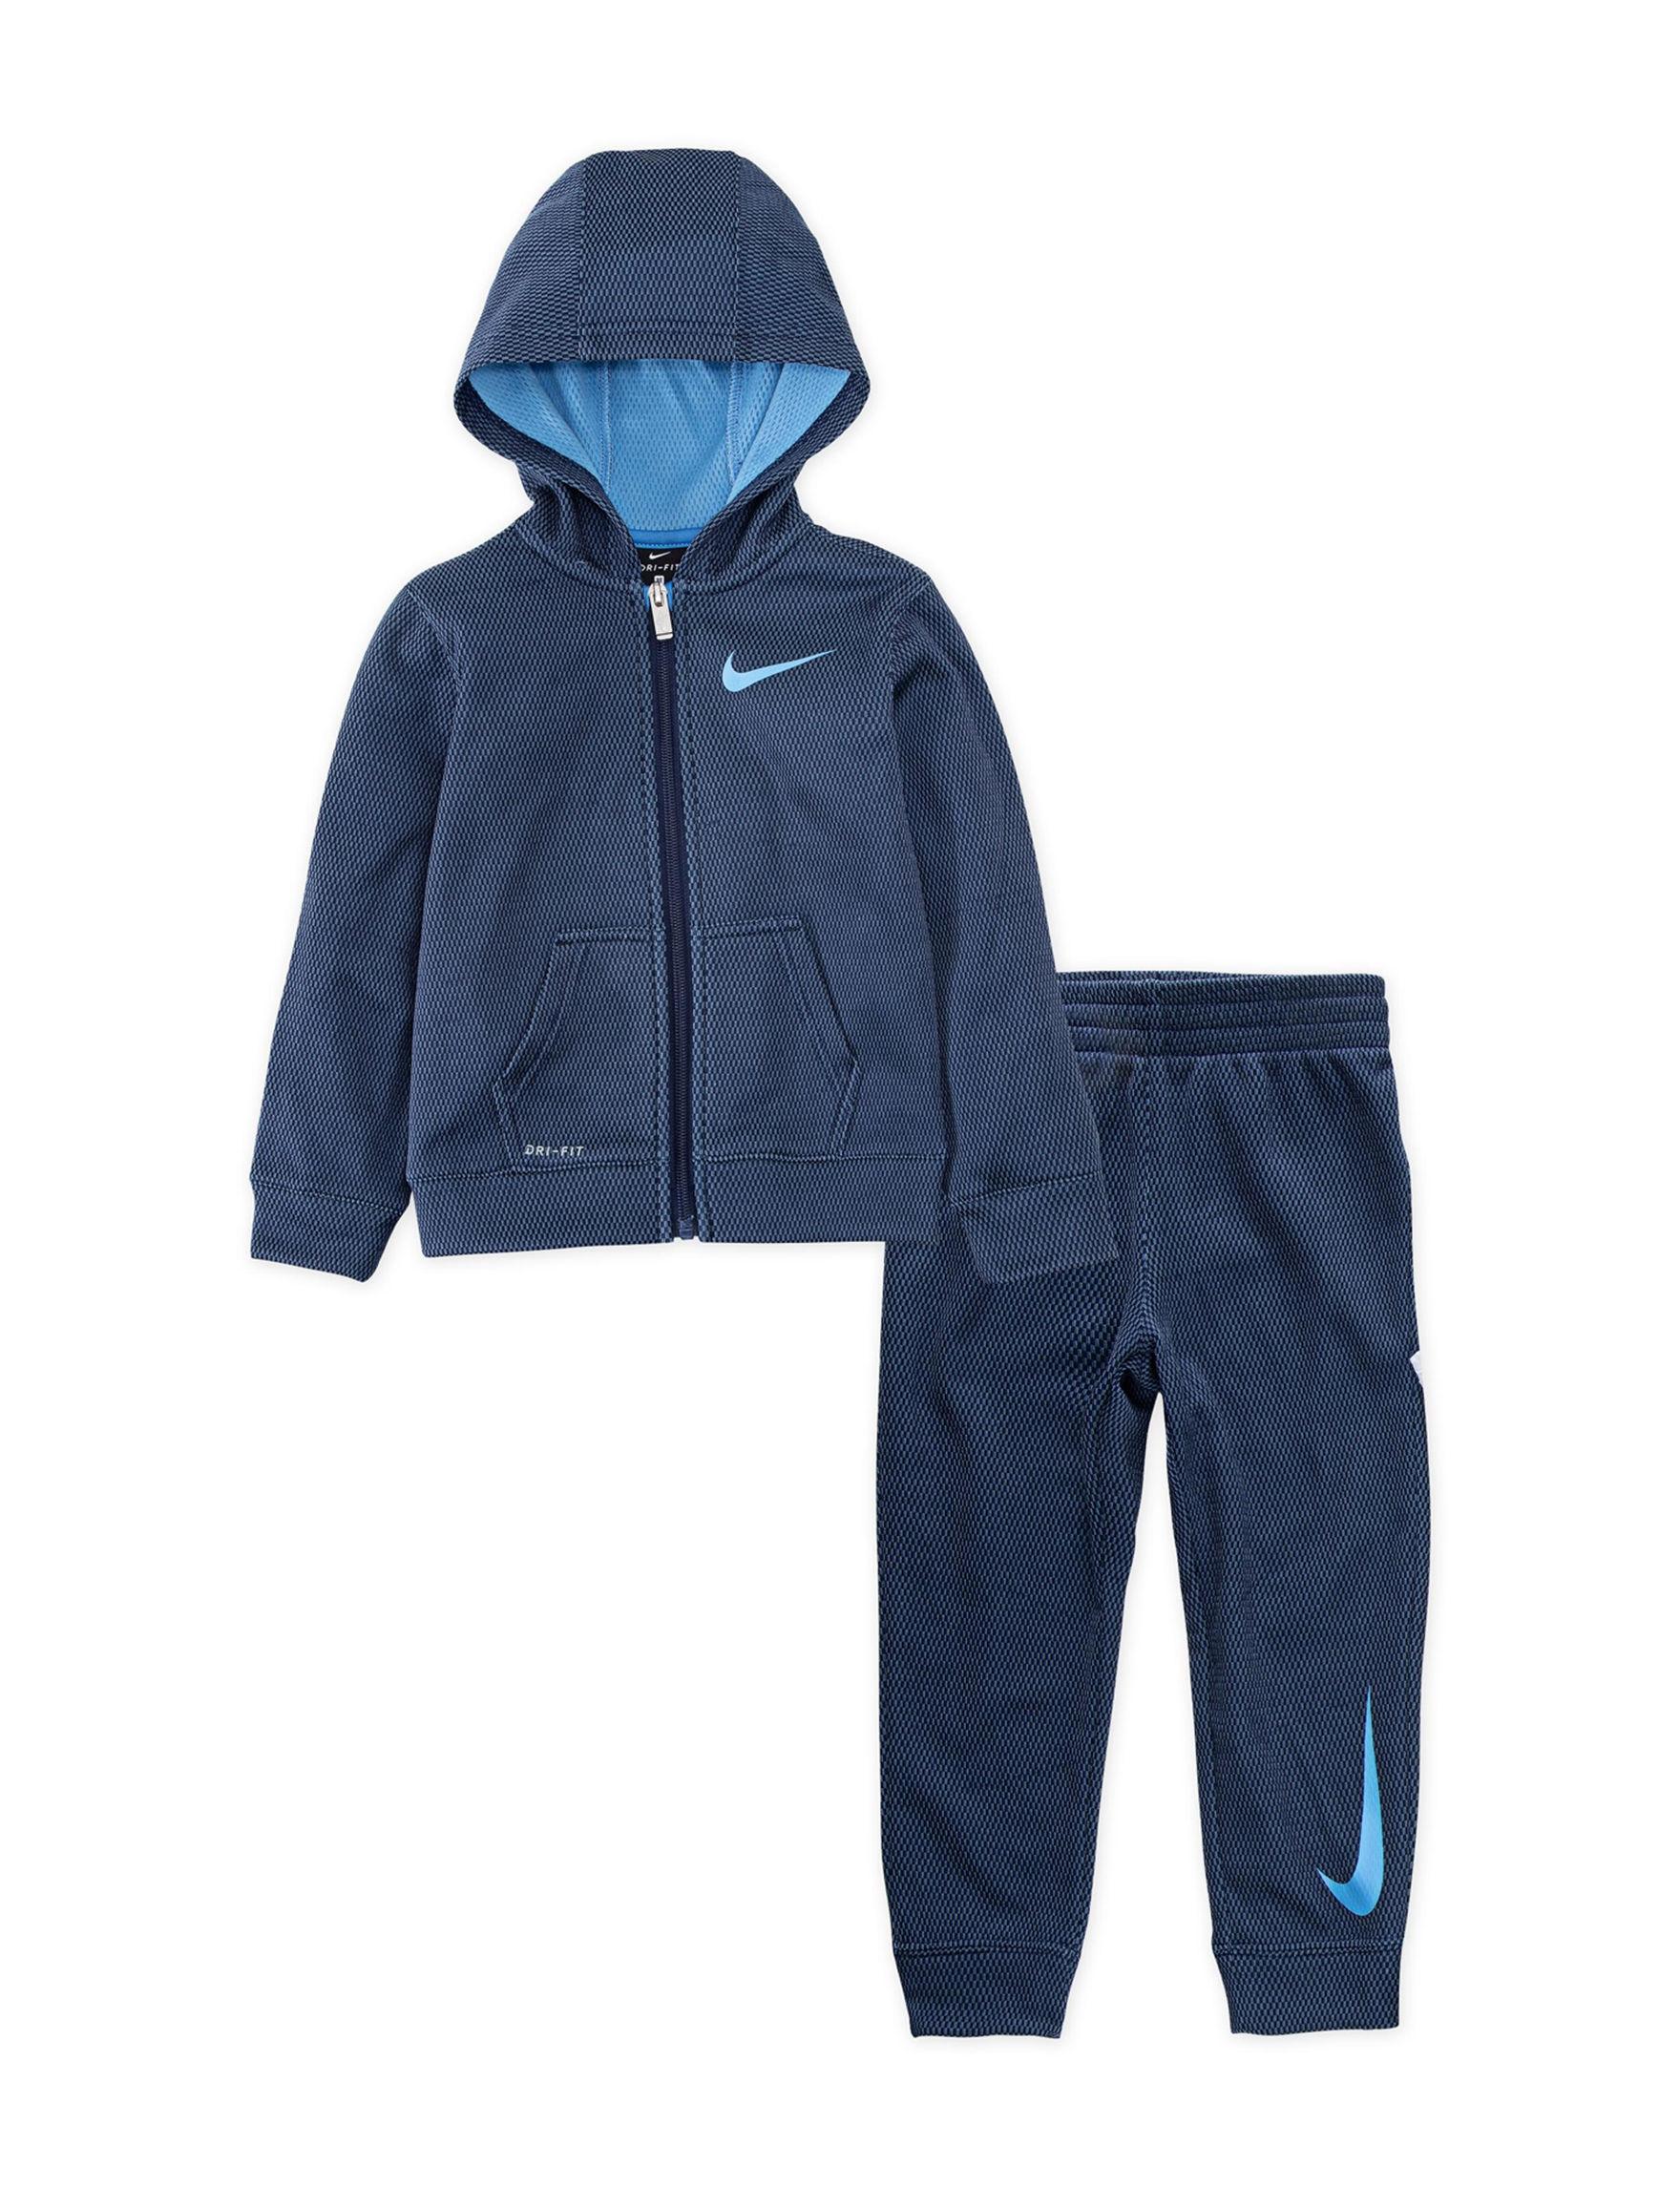 Nike Blue / Navy